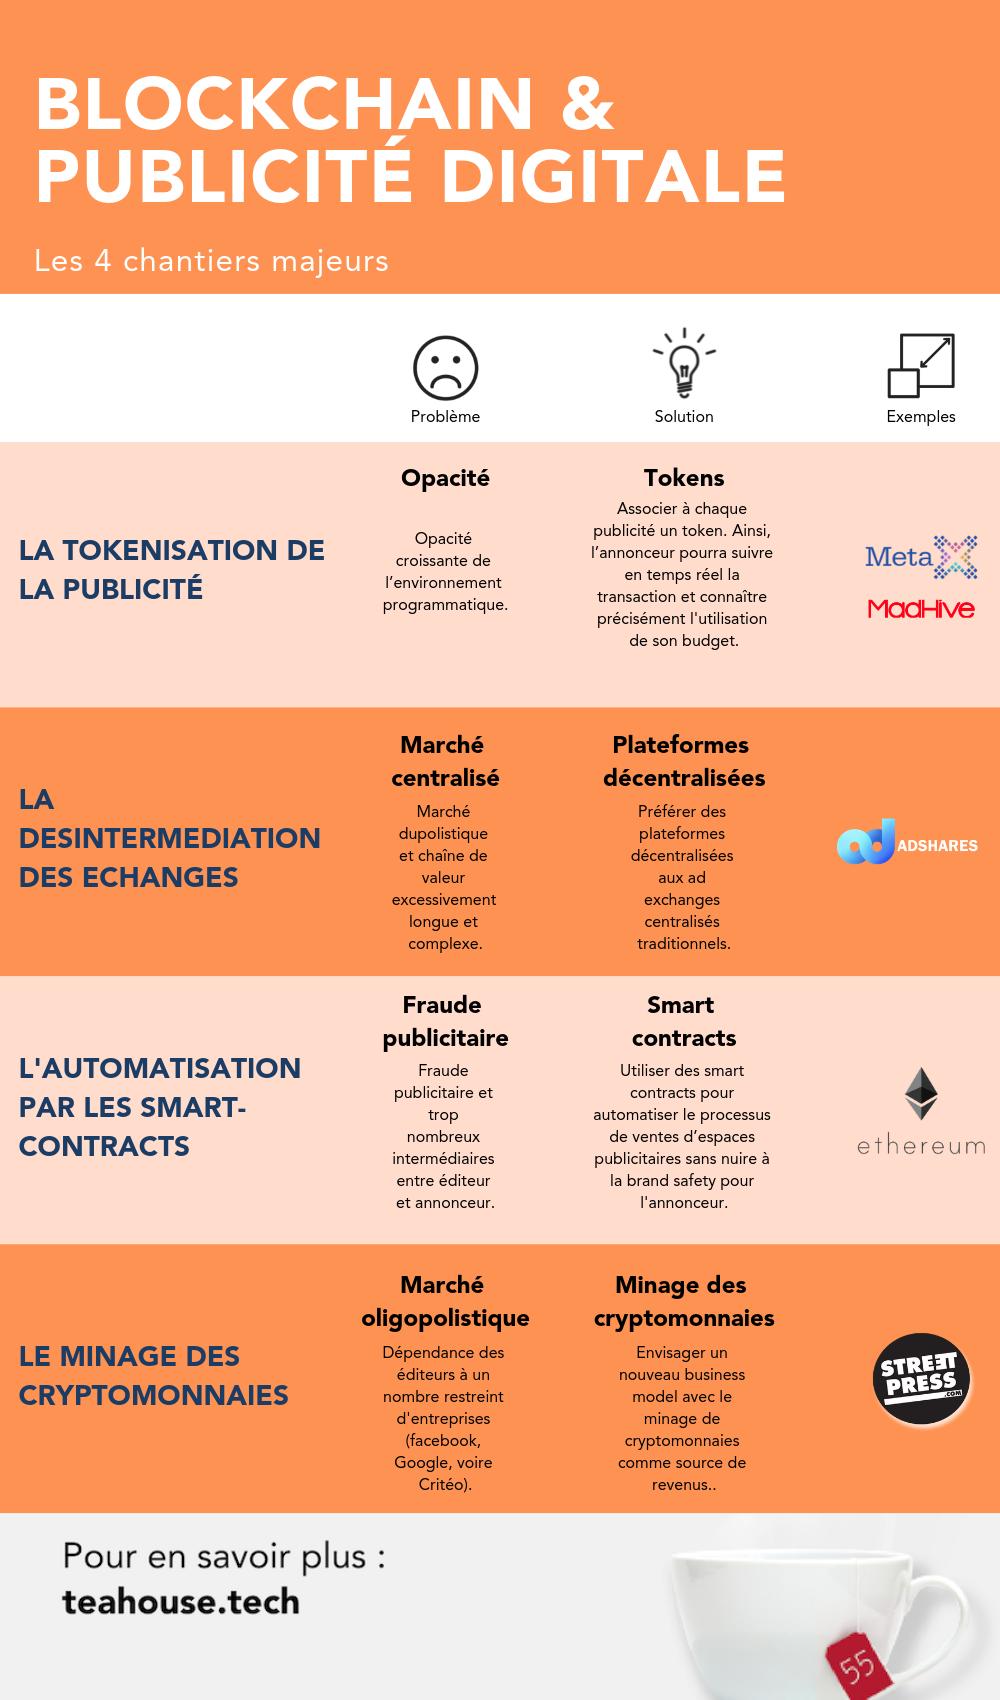 blockchain-et-publicite-digitale